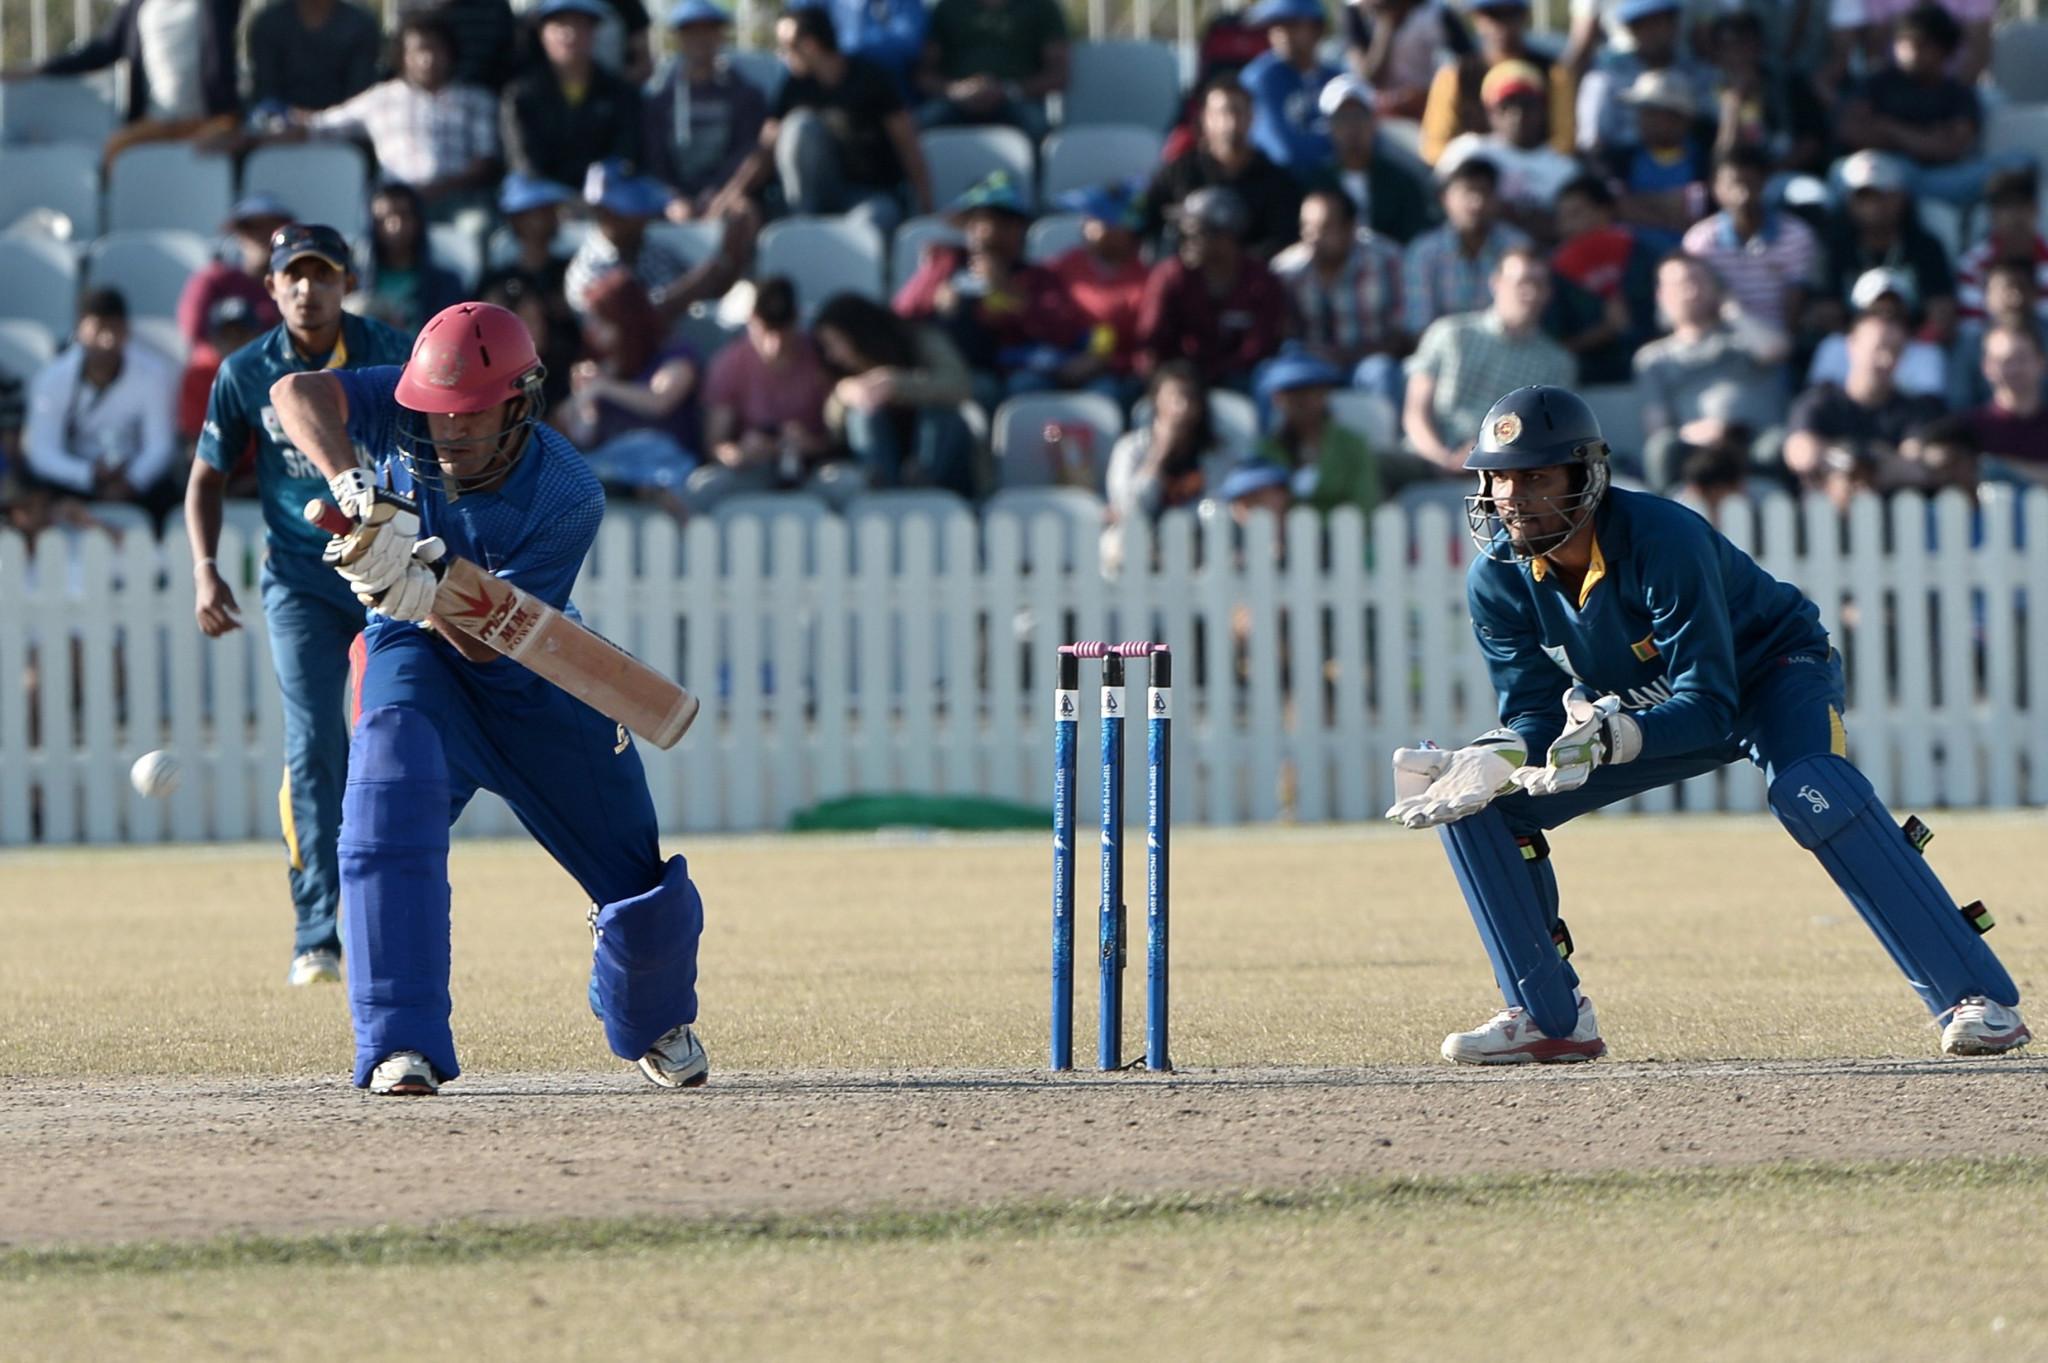 Asian Games No Longer Considering Addition of Australia